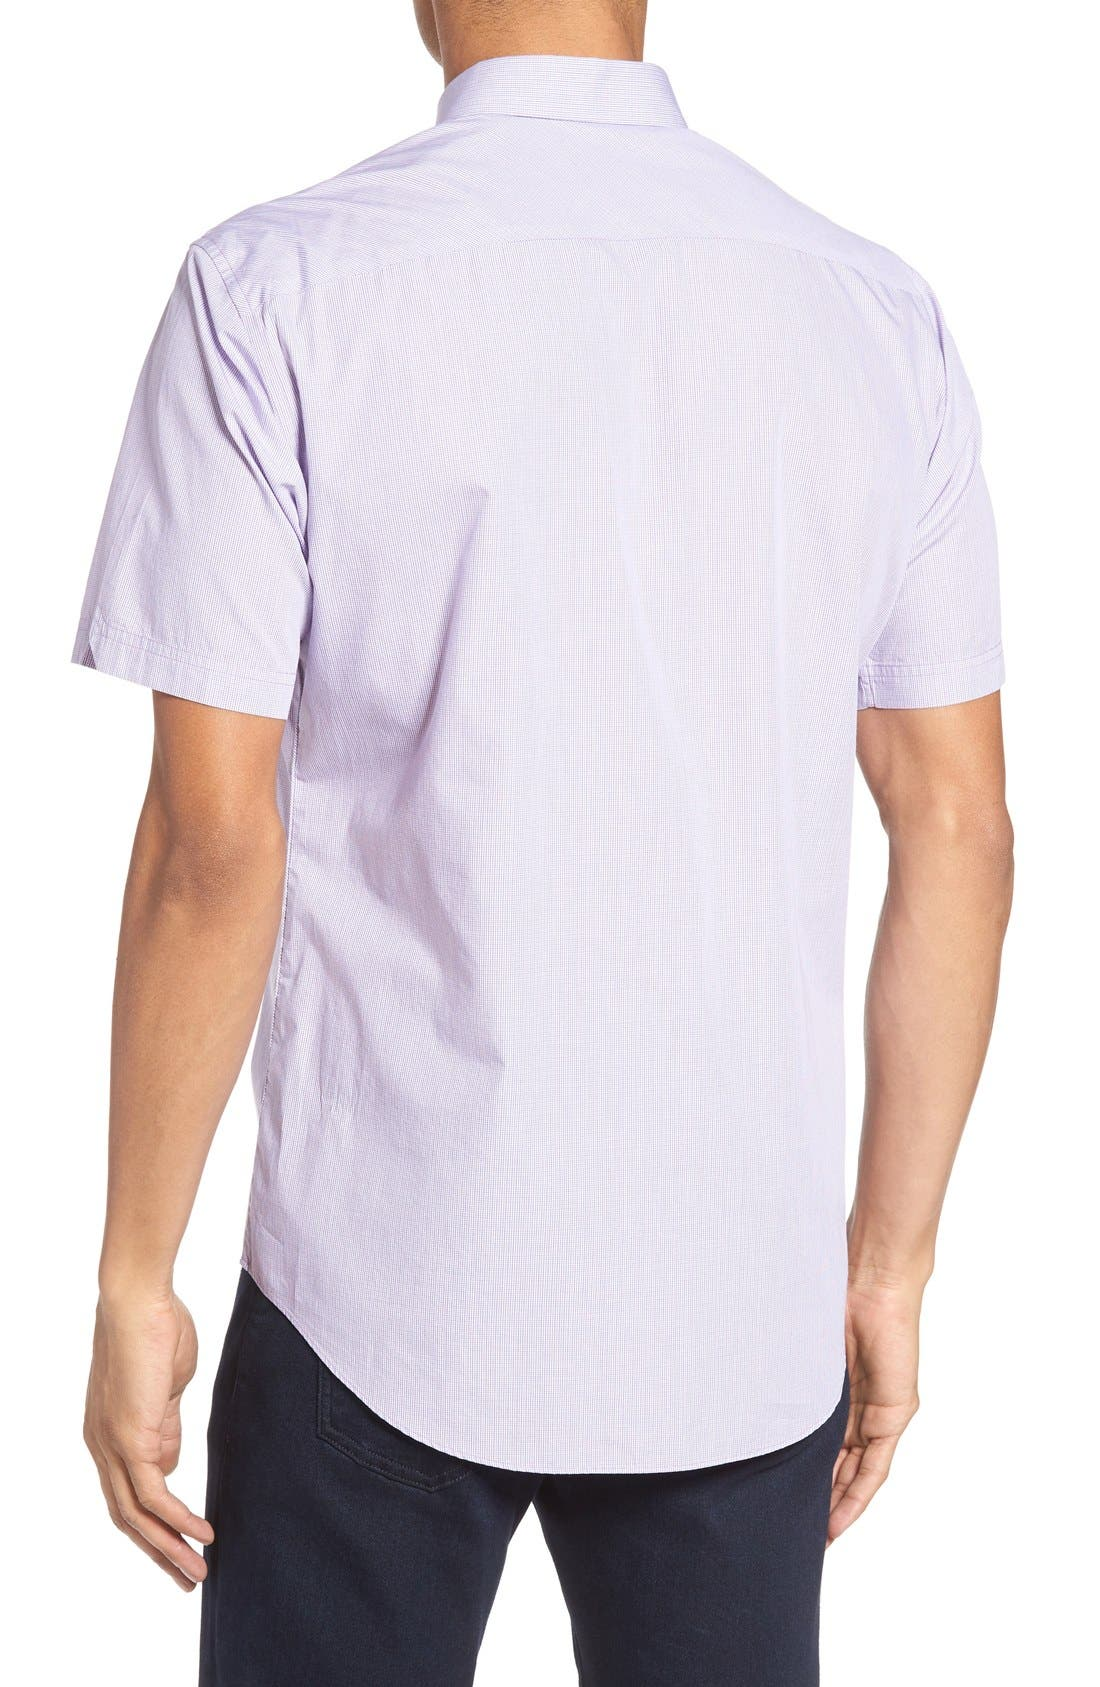 ZACHARY PRELL,                             Friswold Slim Fit Plaid Sport Shirt,                             Alternate thumbnail 6, color,                             500